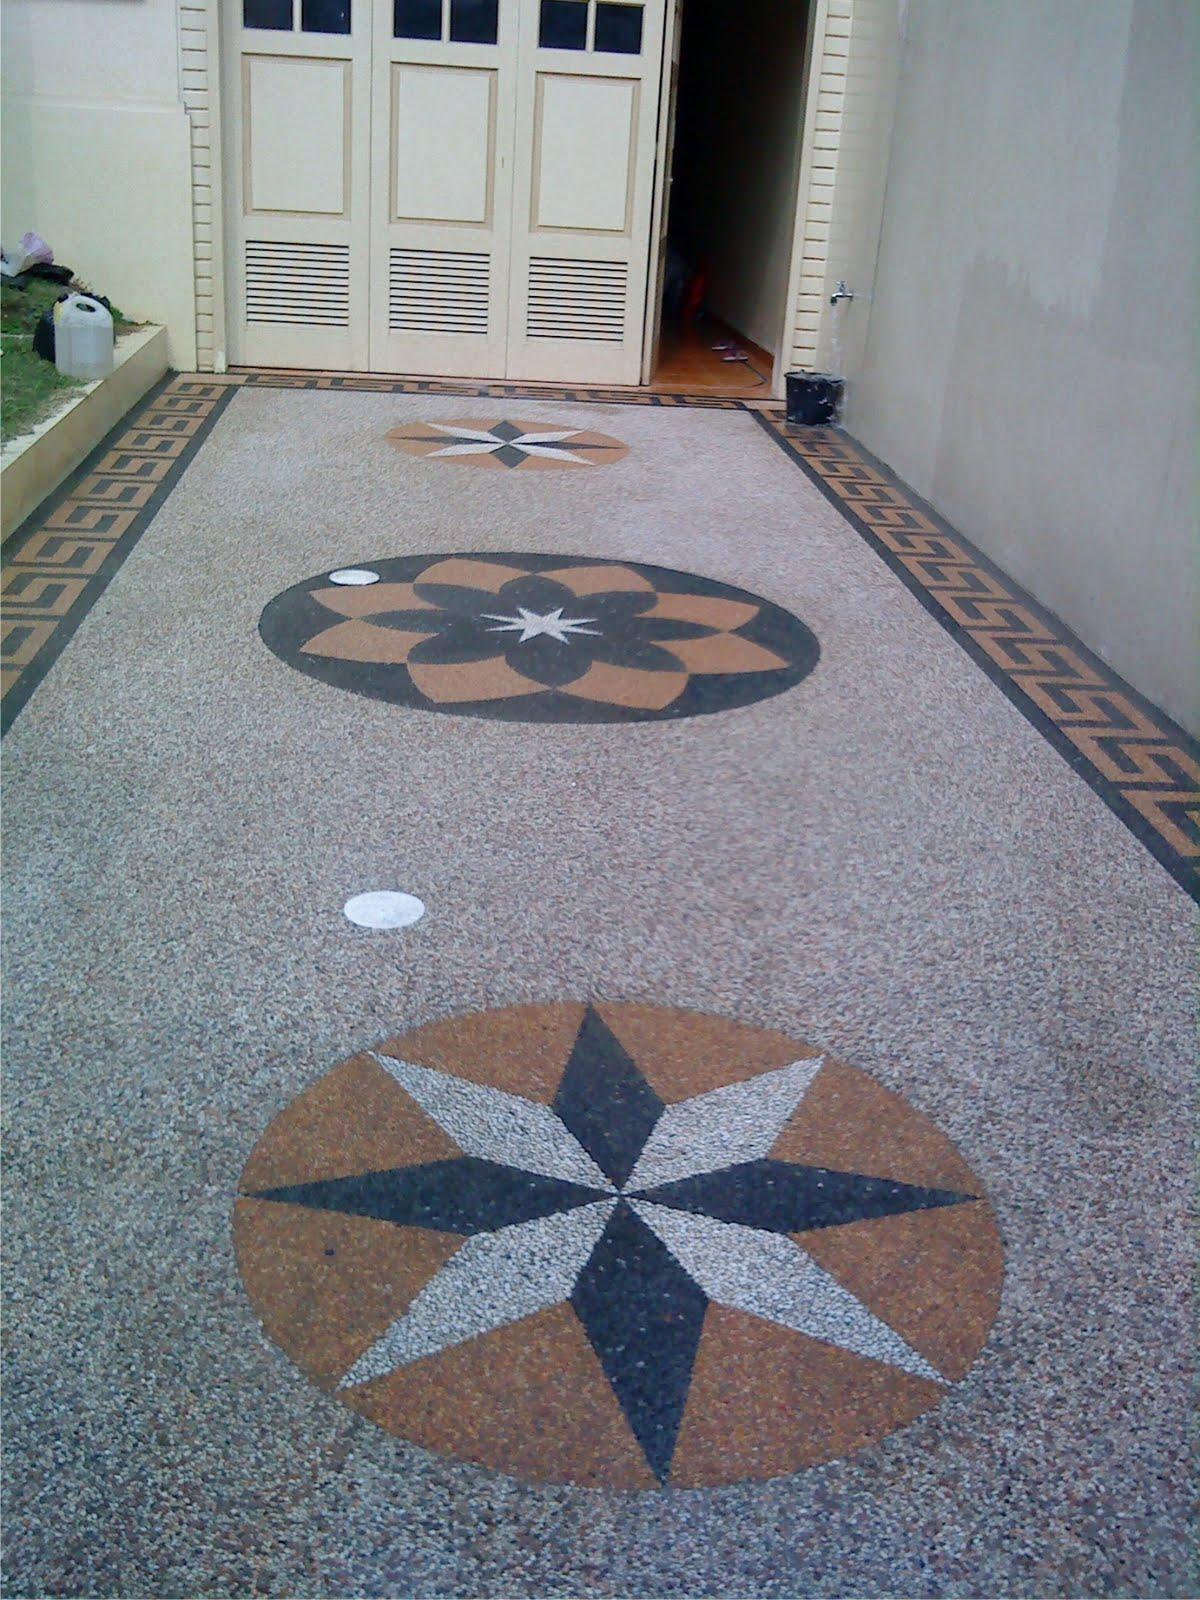 Harga Keramik Lantai Garasi Mobil : harga, keramik, lantai, garasi, mobil, Terbaru, Harga, Keramik, Garasi, 40x40